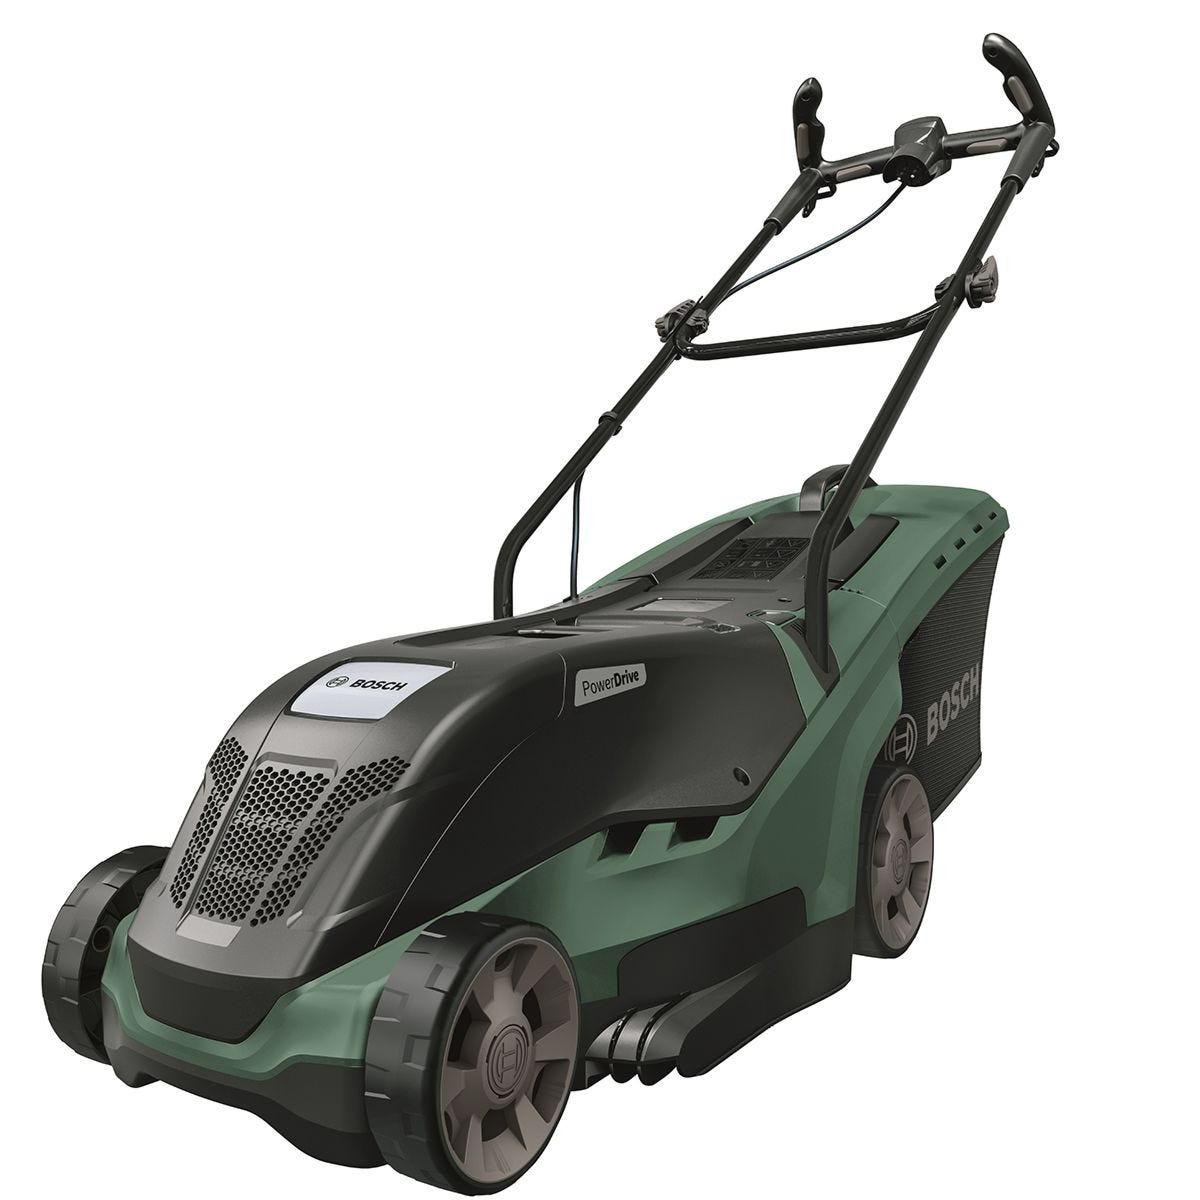 Bosch UniversalRotak 550 Corded Lawnmower